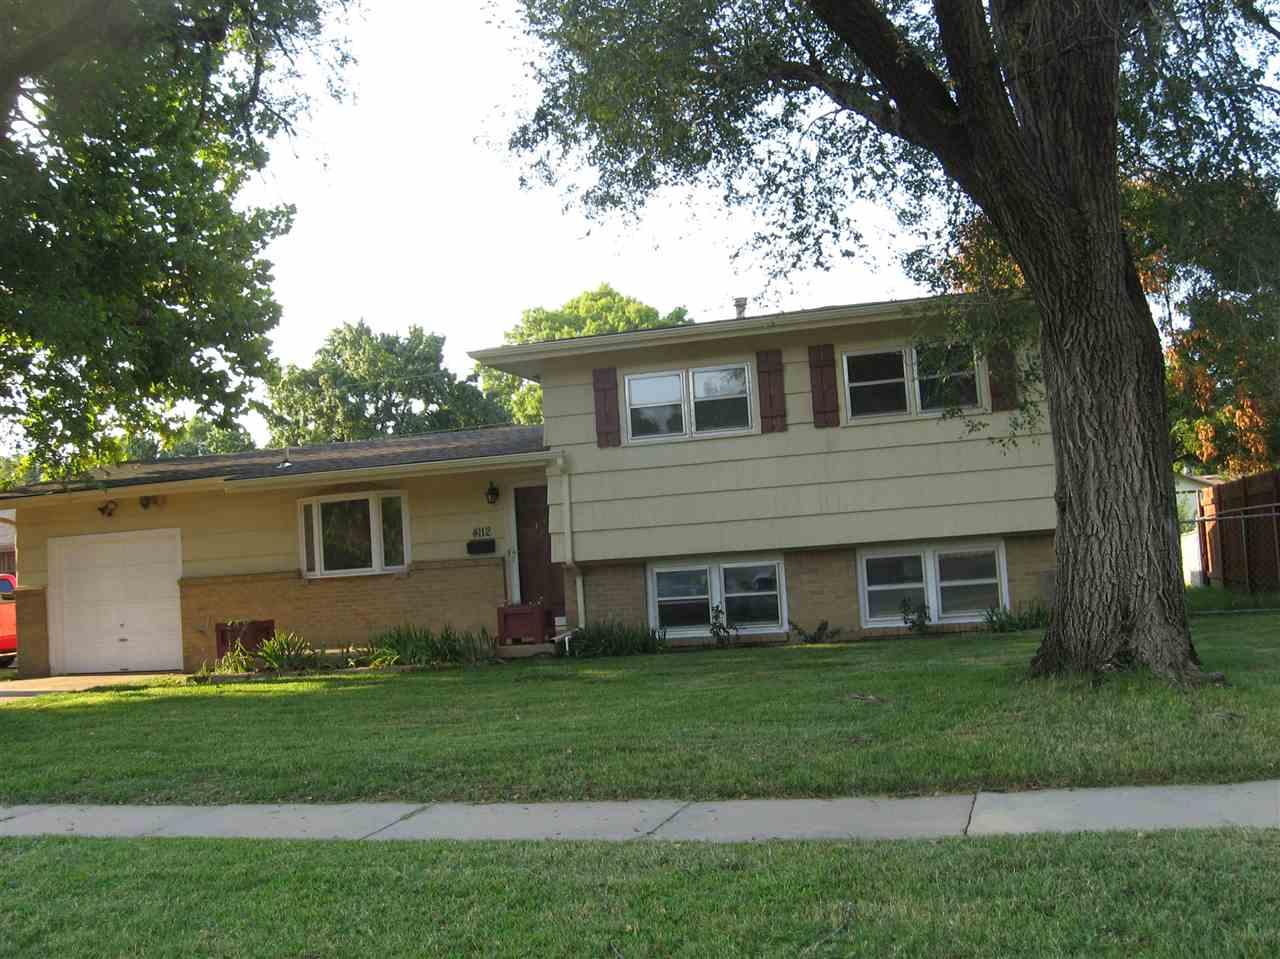 4112 W Westport, Wichita, KS 67212